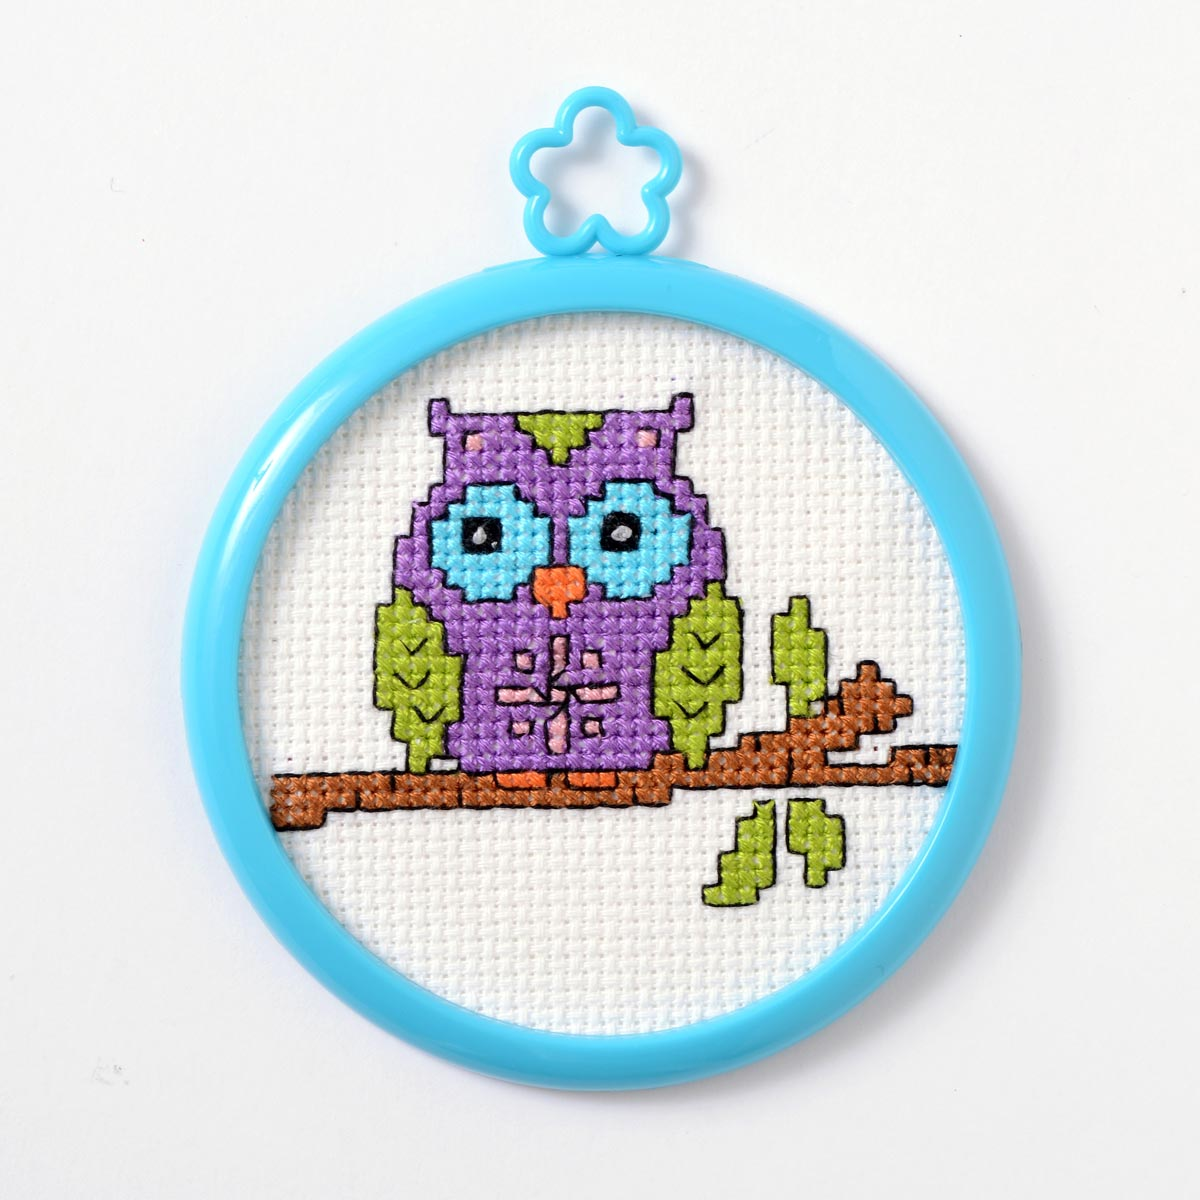 Bucilla ® My 1st Stitch™ - Counted Cross Stitch Kits - Mini - Owl on a Branch